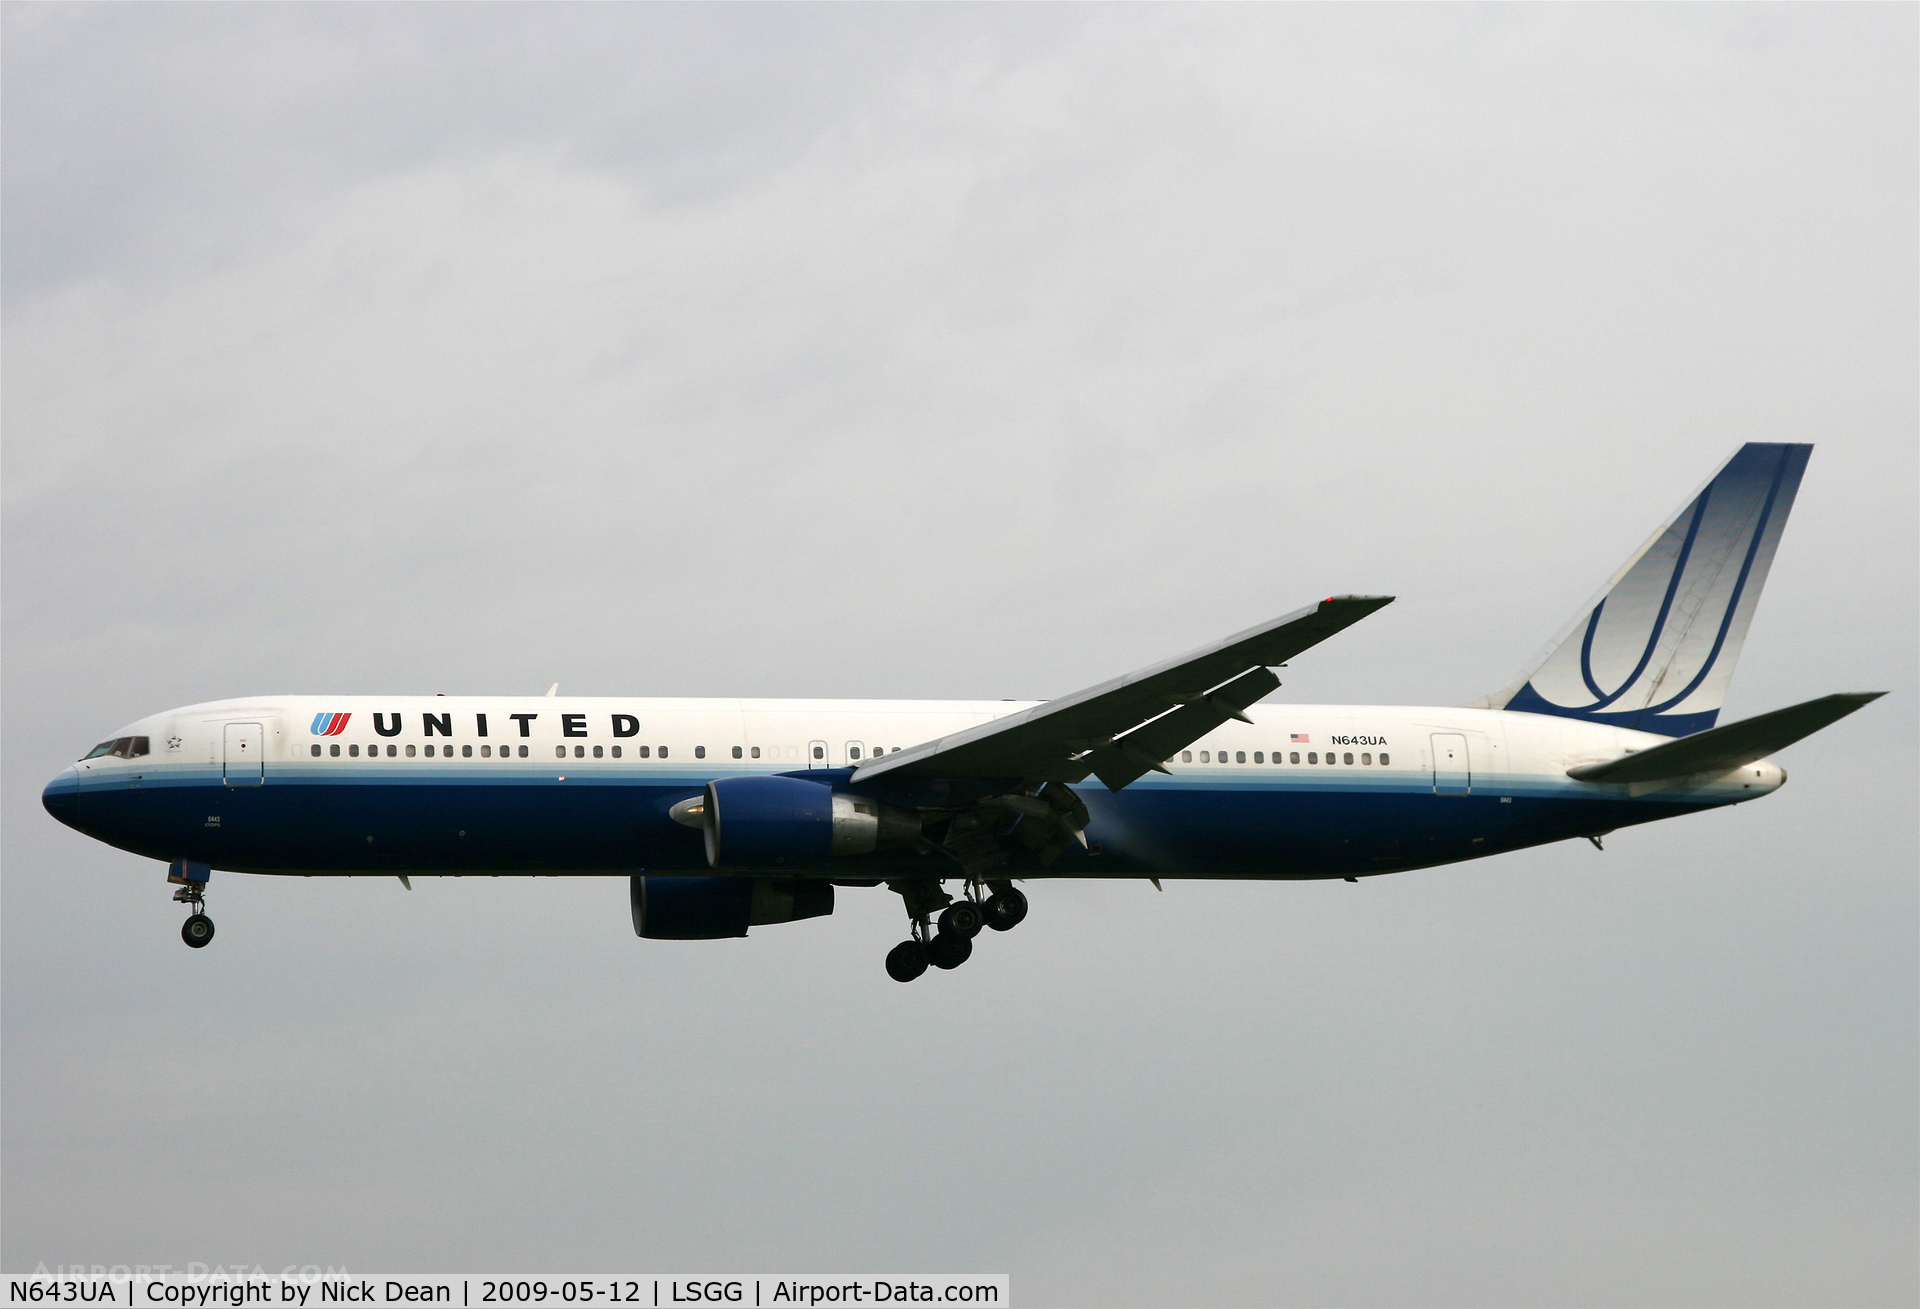 N643UA, 1991 Boeing 767-322/ER C/N 25093, LSGG